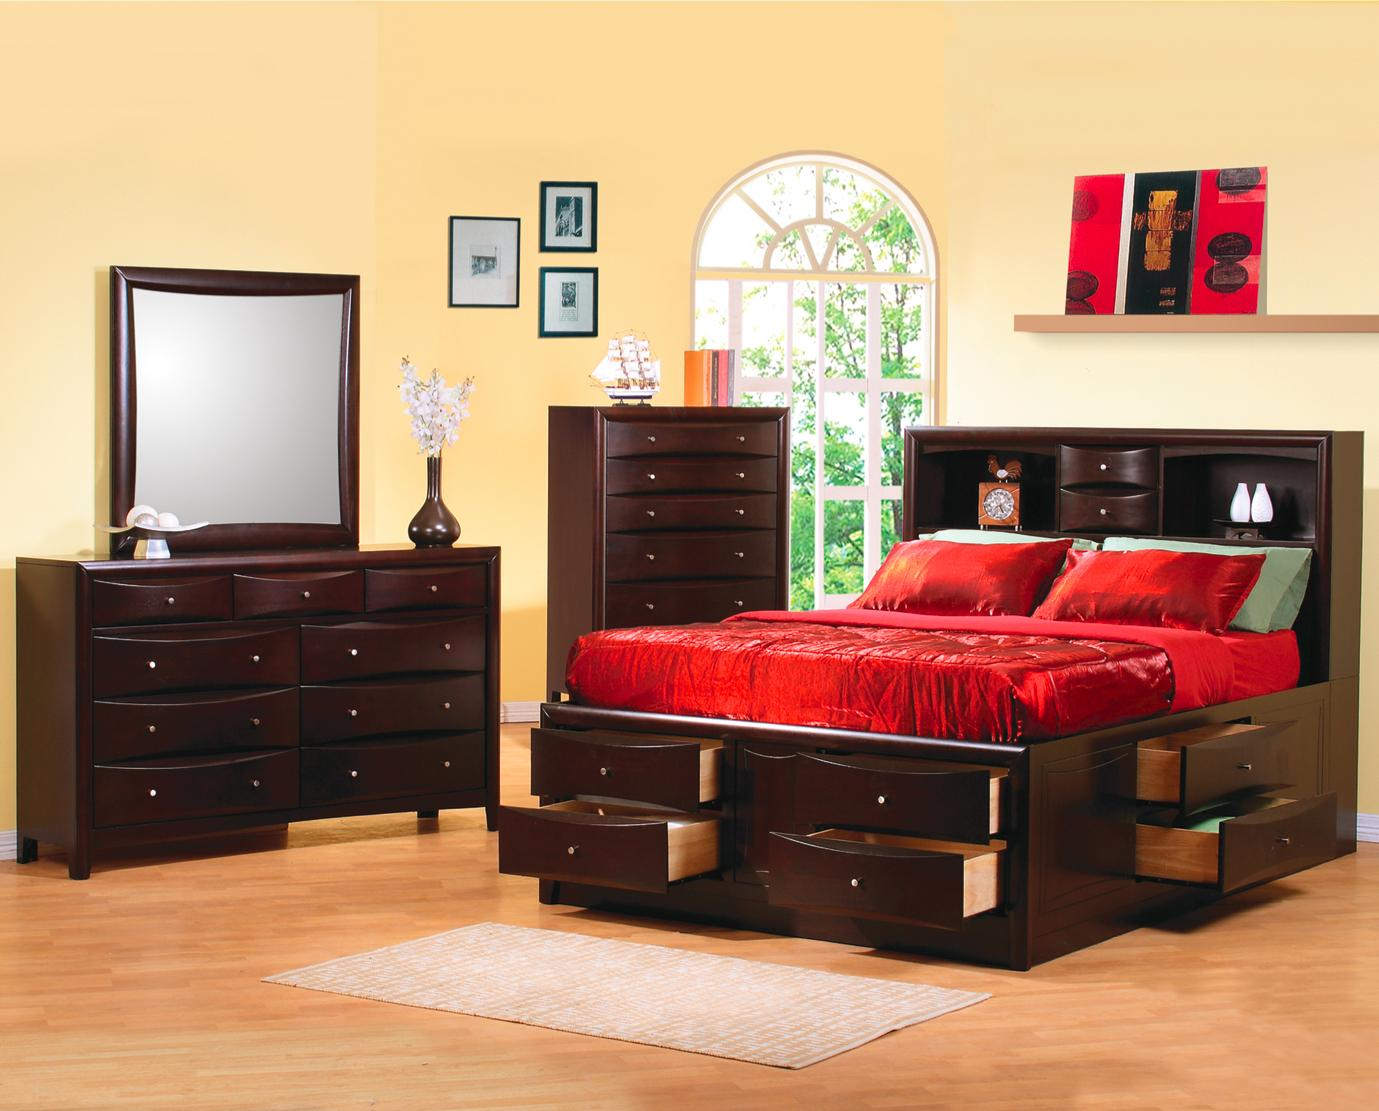 Coaster Furniture - Phoenix Bedroom Set